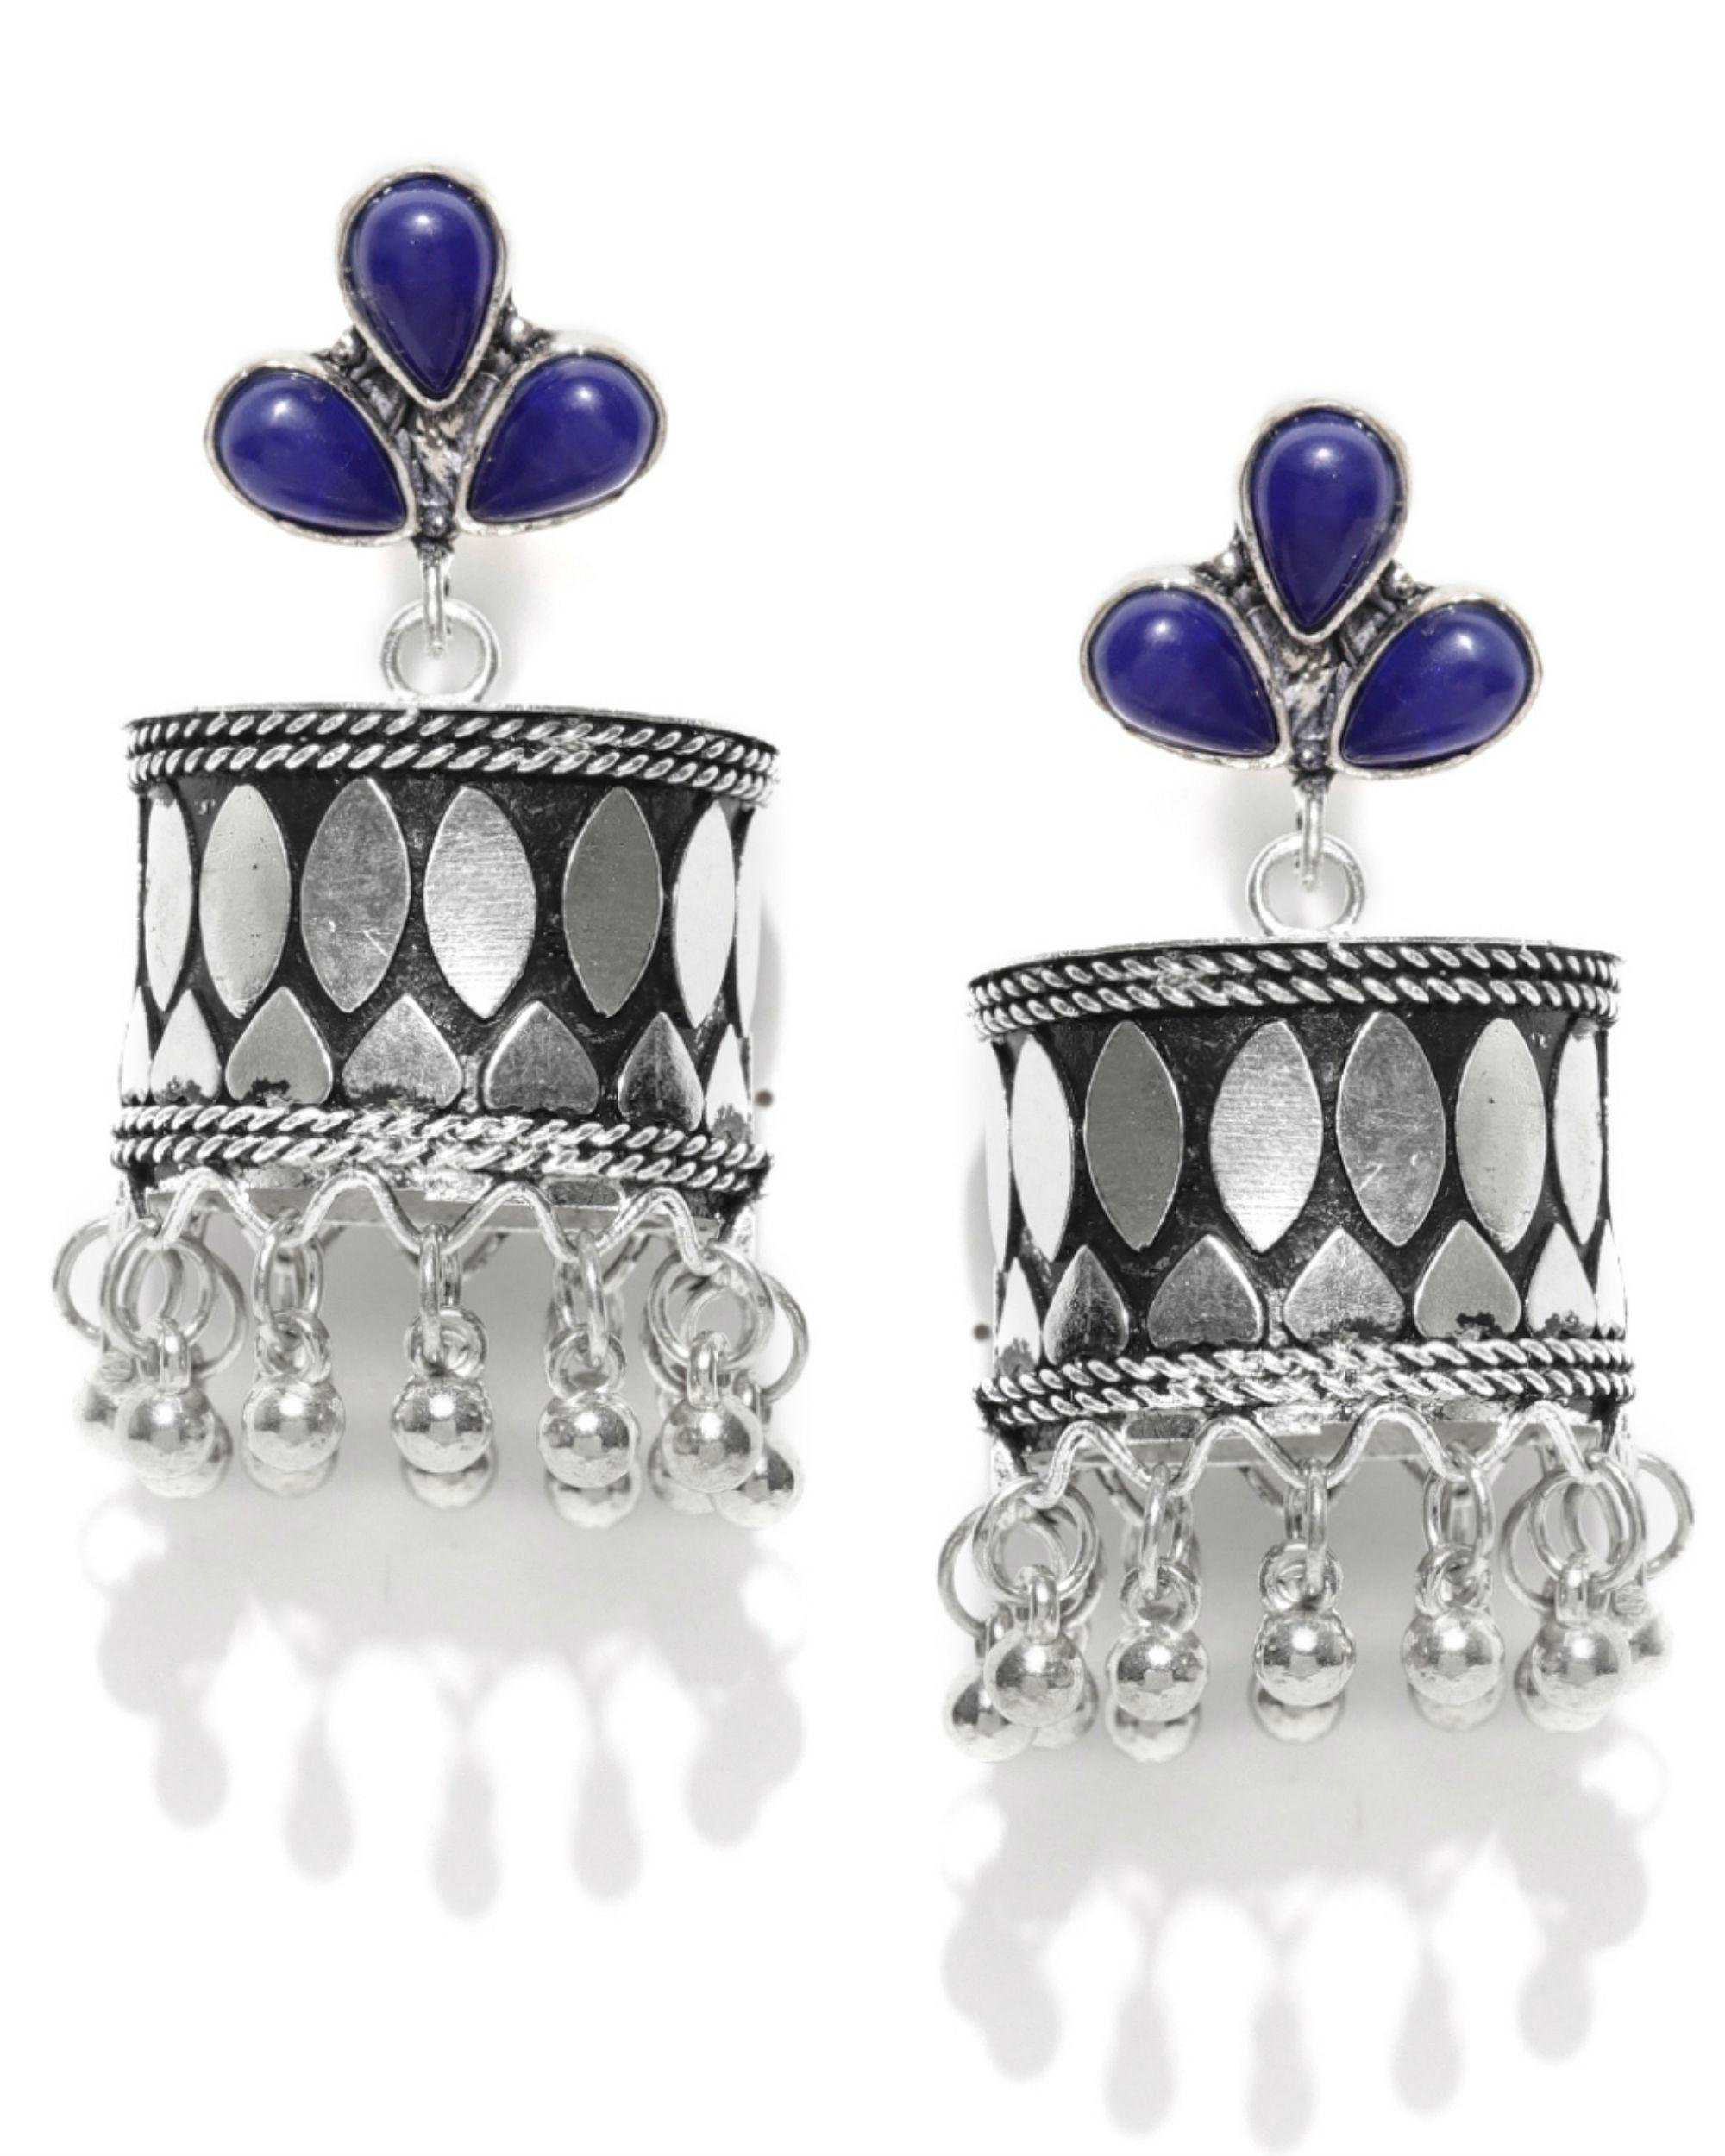 Silver-toned & navy blue beaded jhumkas